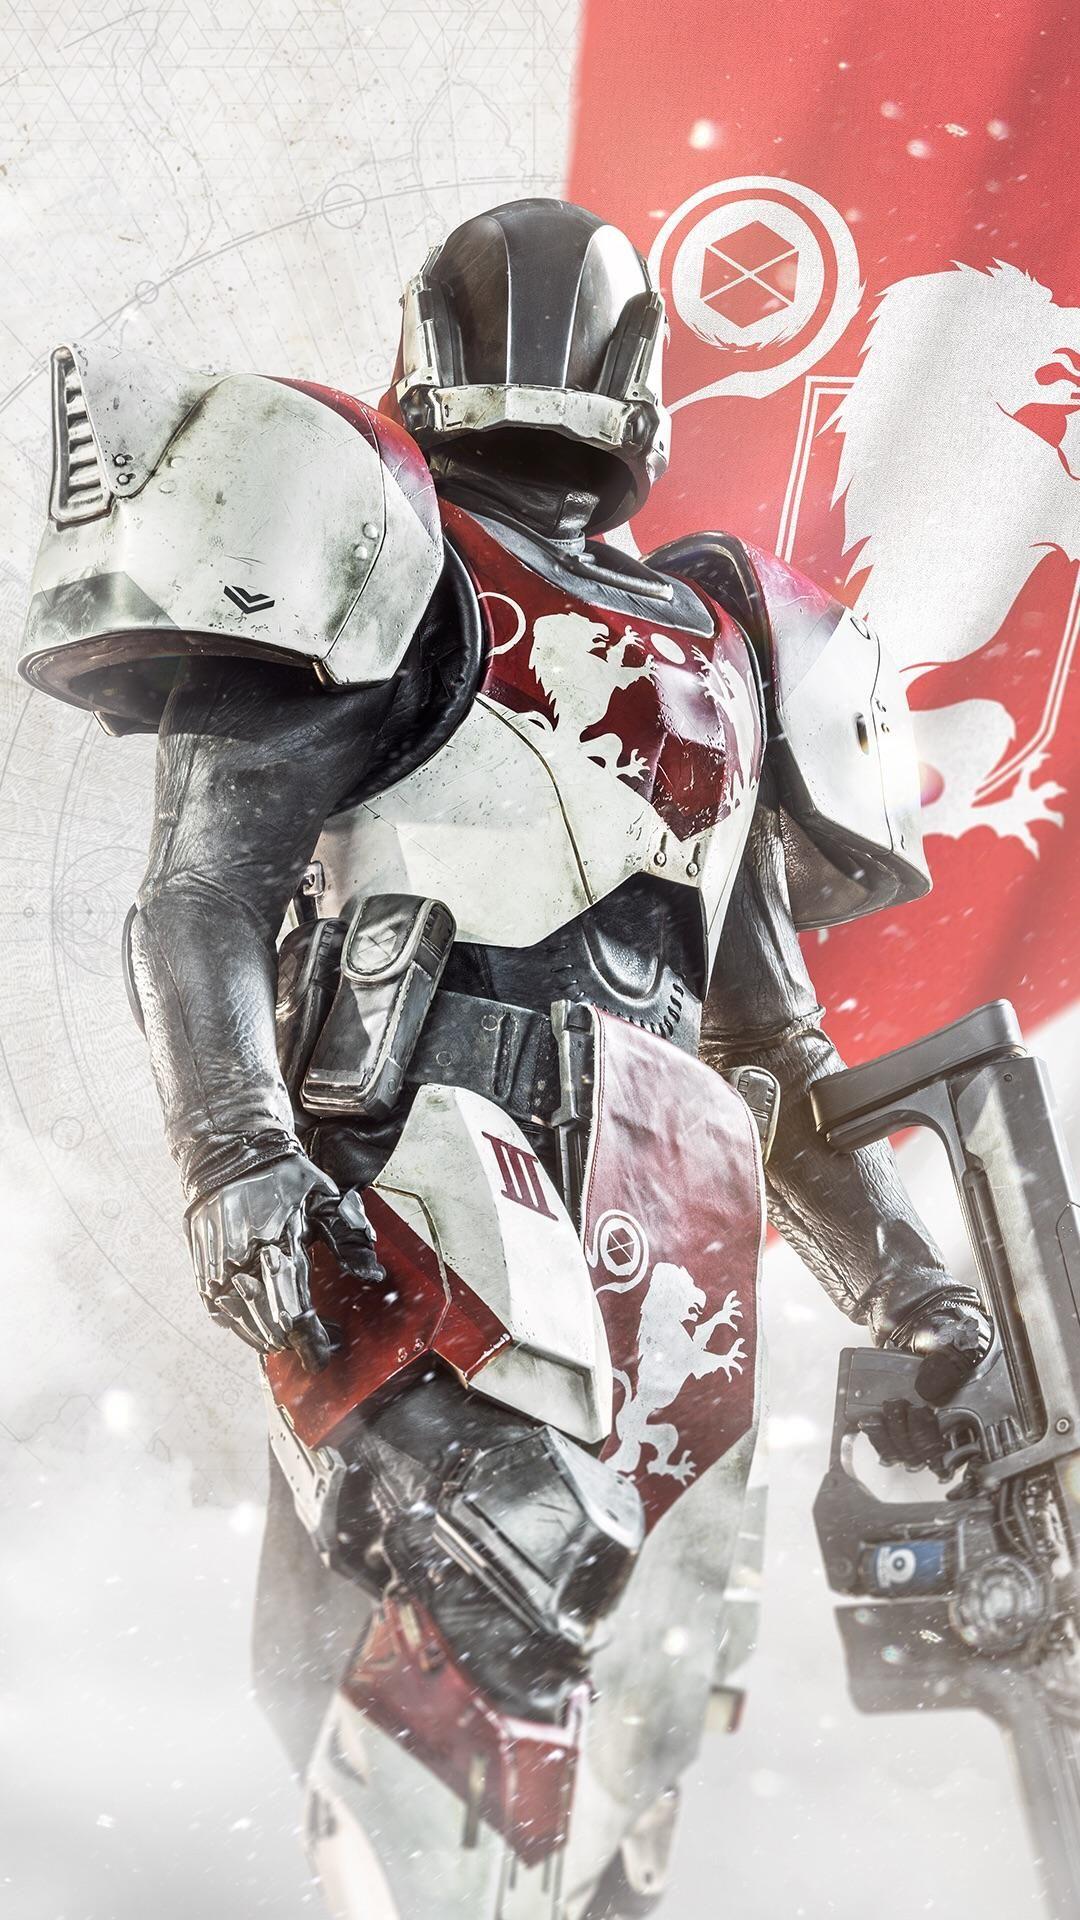 Destiny 2 Titan Smartphone Wallpaper Destiny Game Destiny Titans